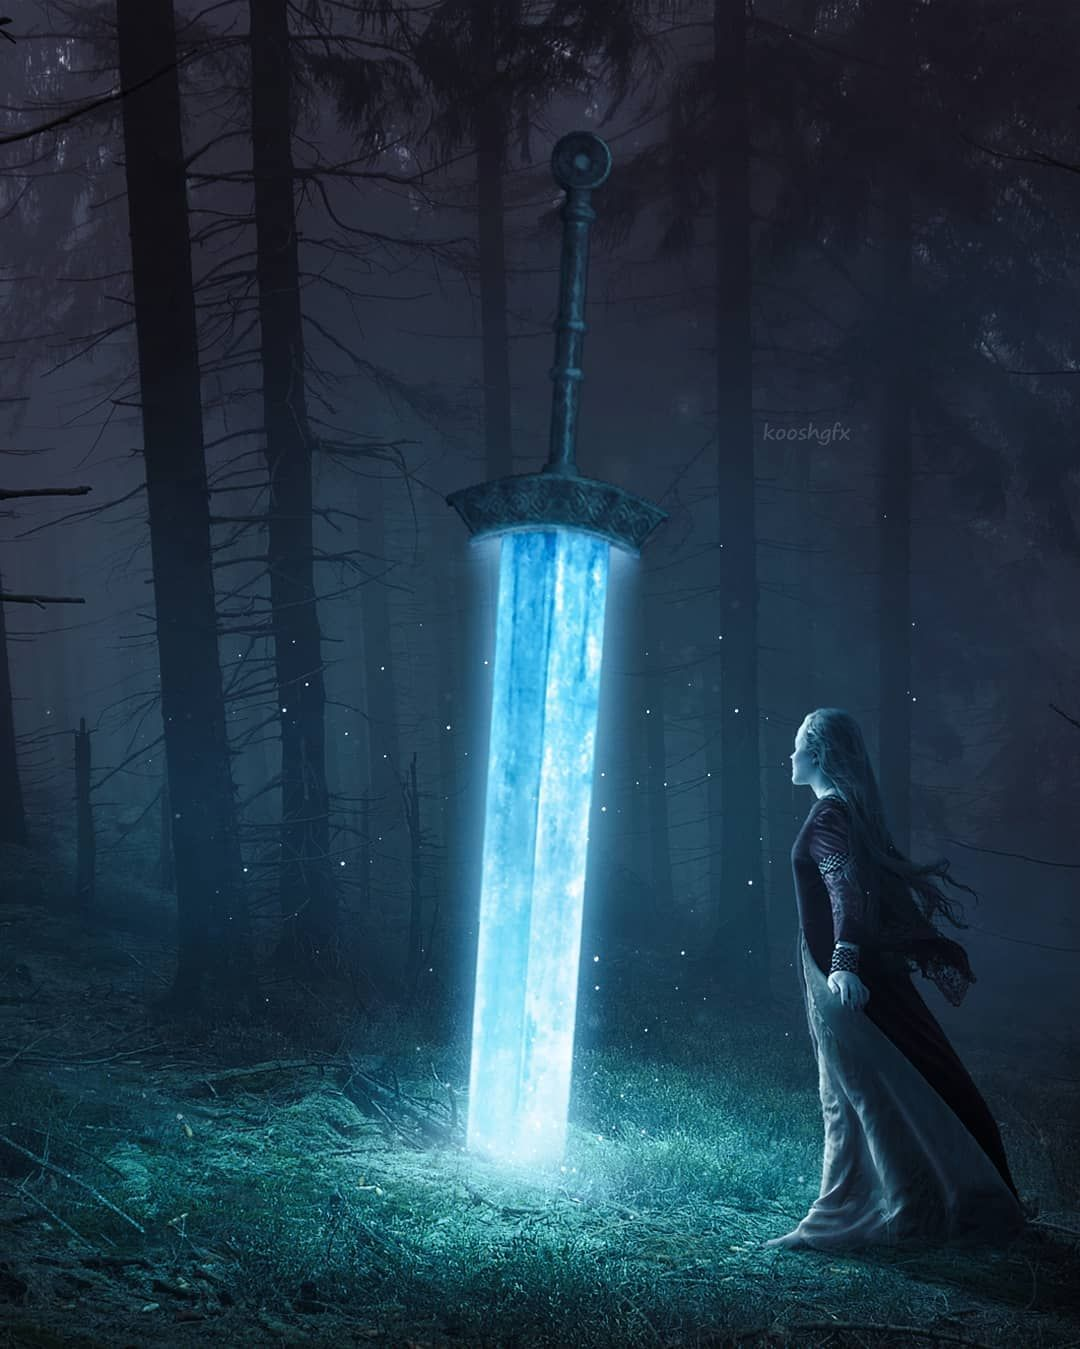 Mystical Sword Art By Kooshgfx Galaxy Phone Wallpaper Alone Art Beautiful Nature Wallpaper